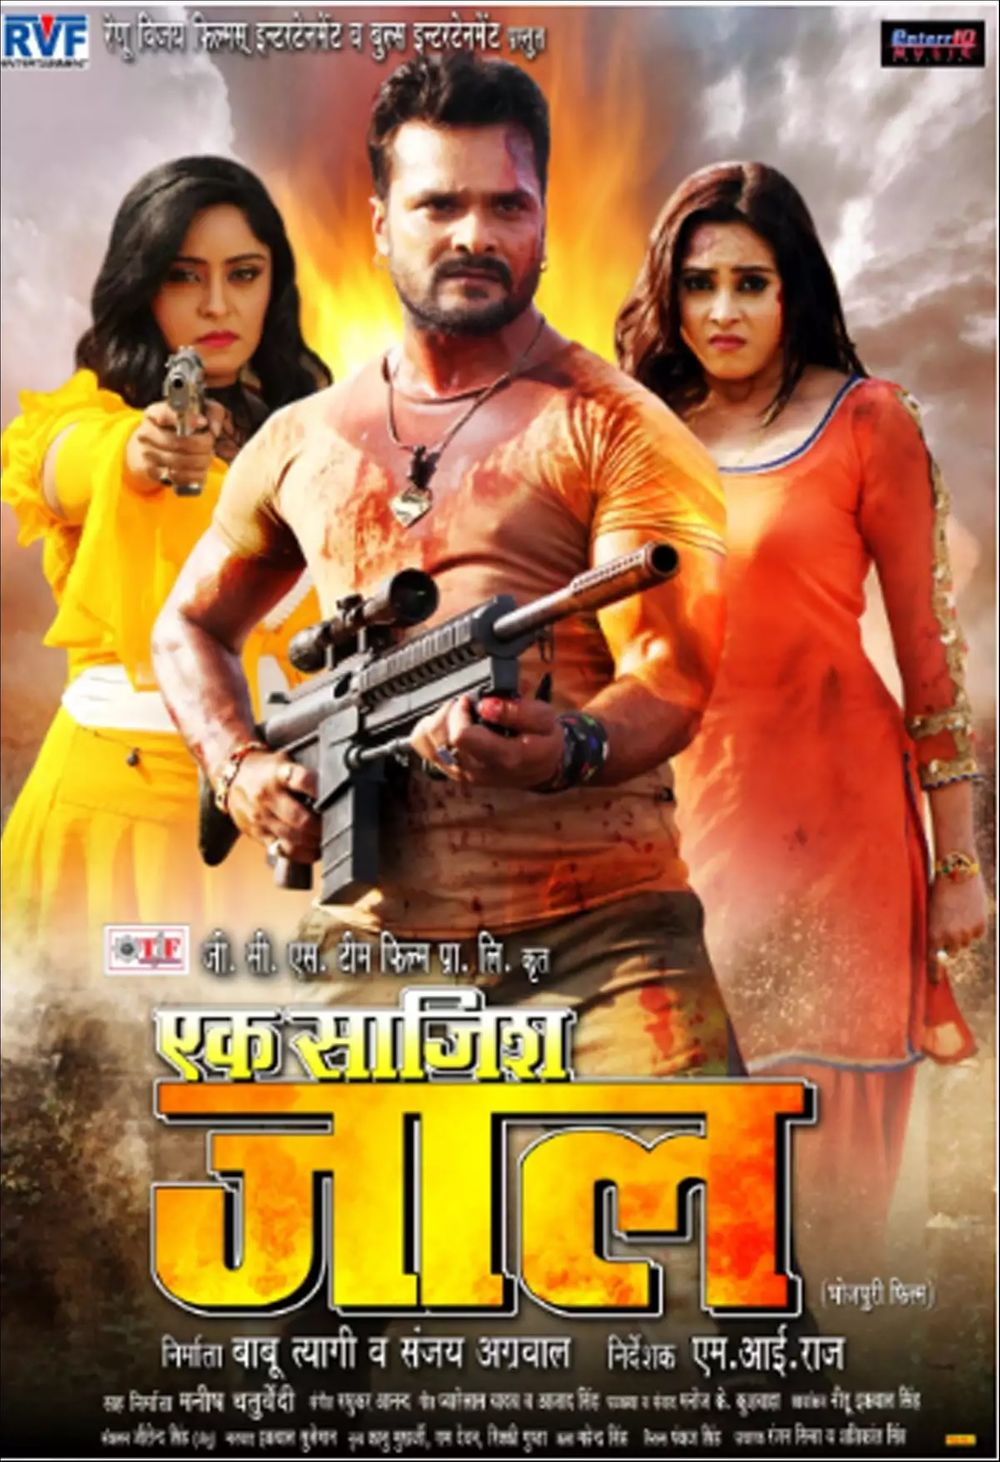 Ek Saazish Jaal 2020 Bhojpuri 450MB HDTV Download